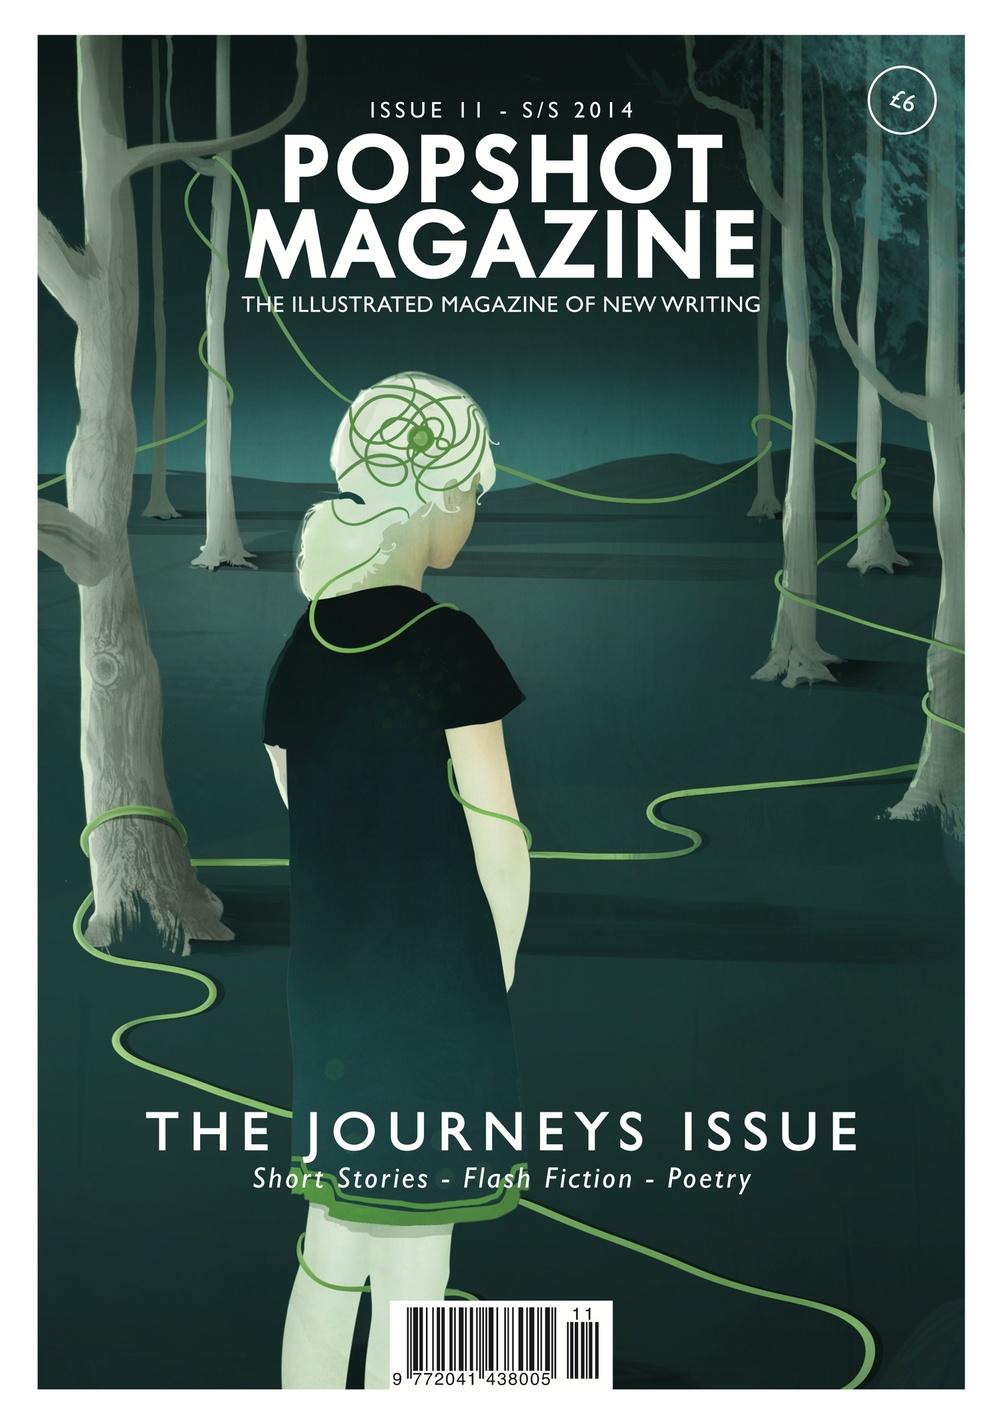 Popshot Magazine: The Journeys Issue